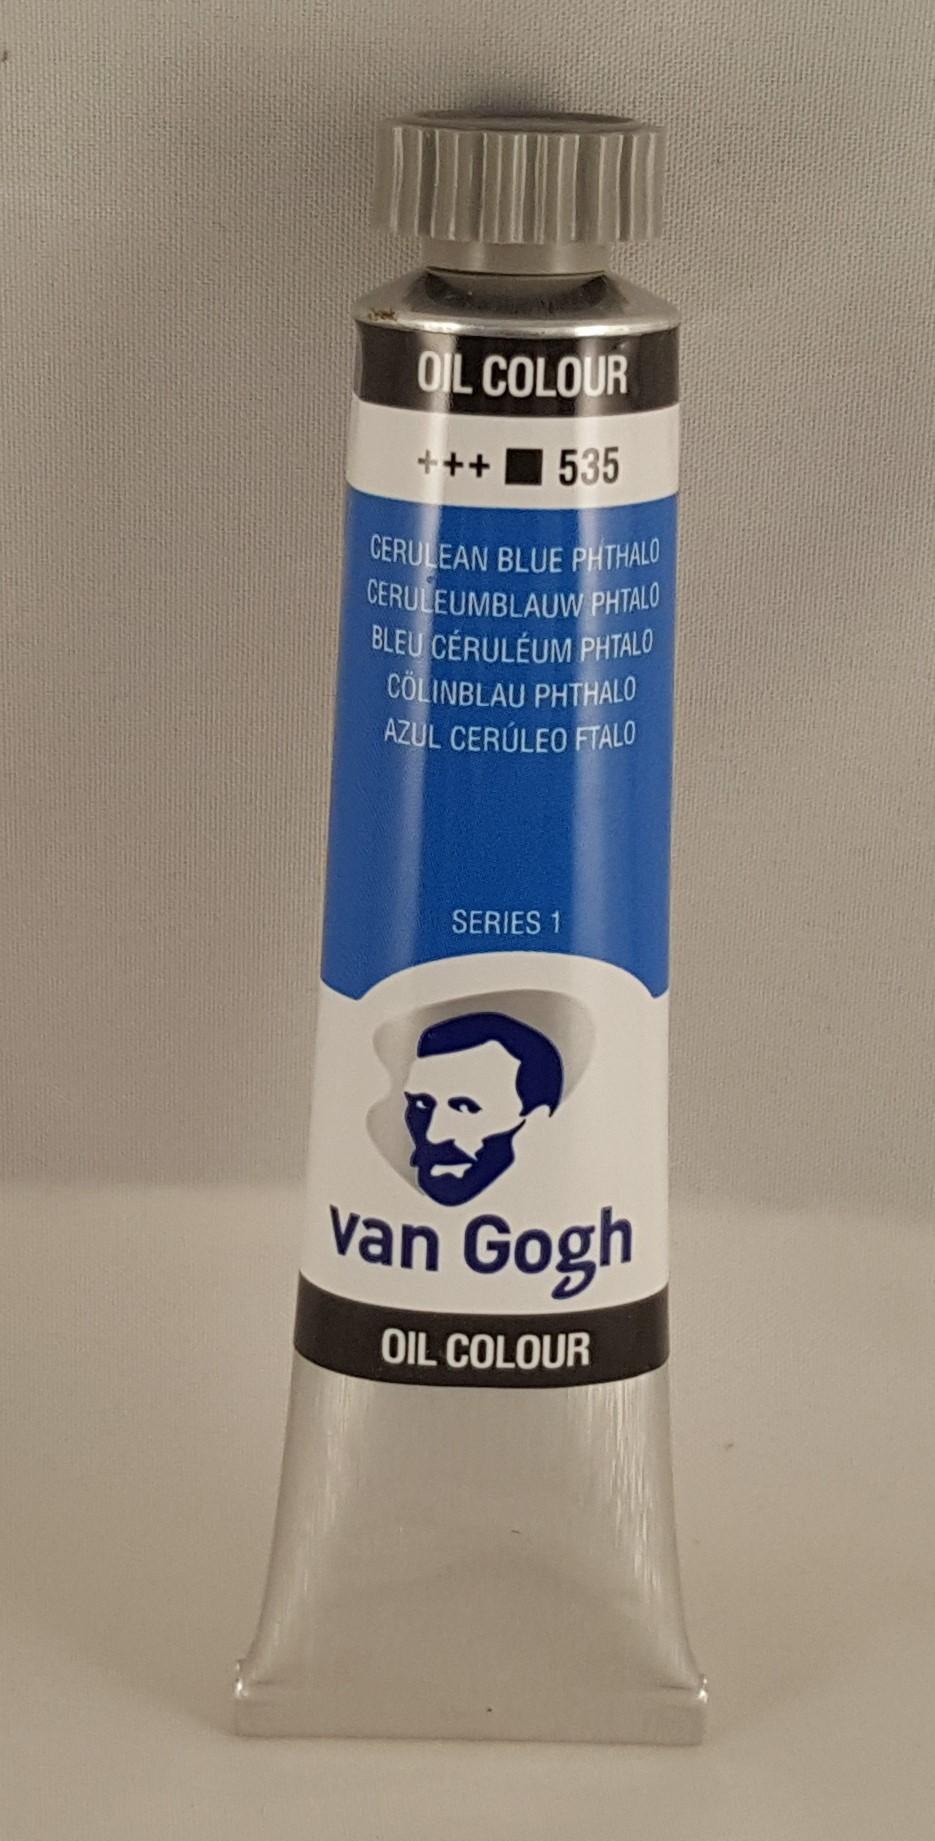 Tinta de óleo Van Gogh cerulean blue phthalo